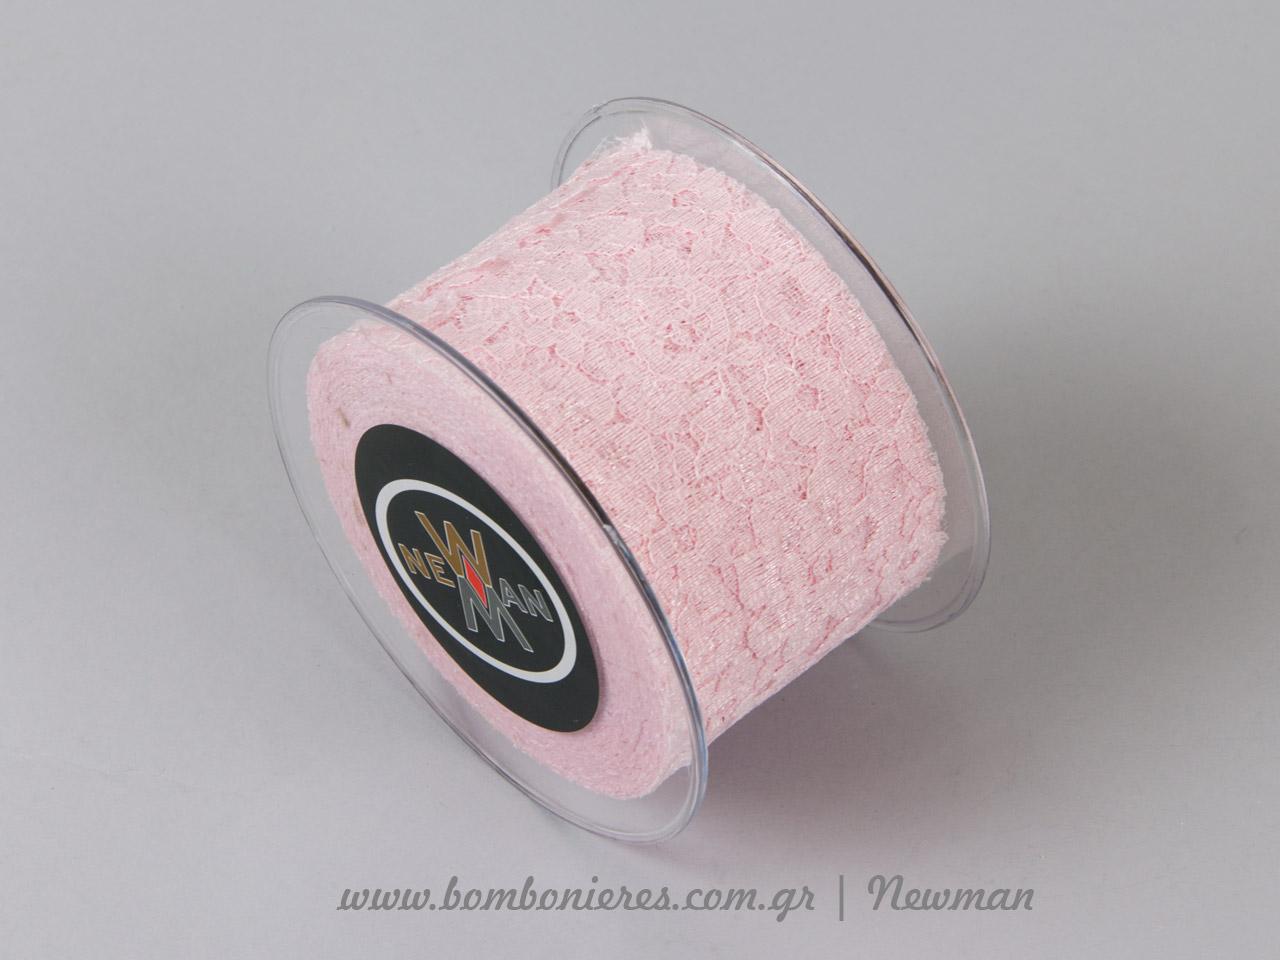 venezzia dantela 67mm 092065 δαντέλα ροζ